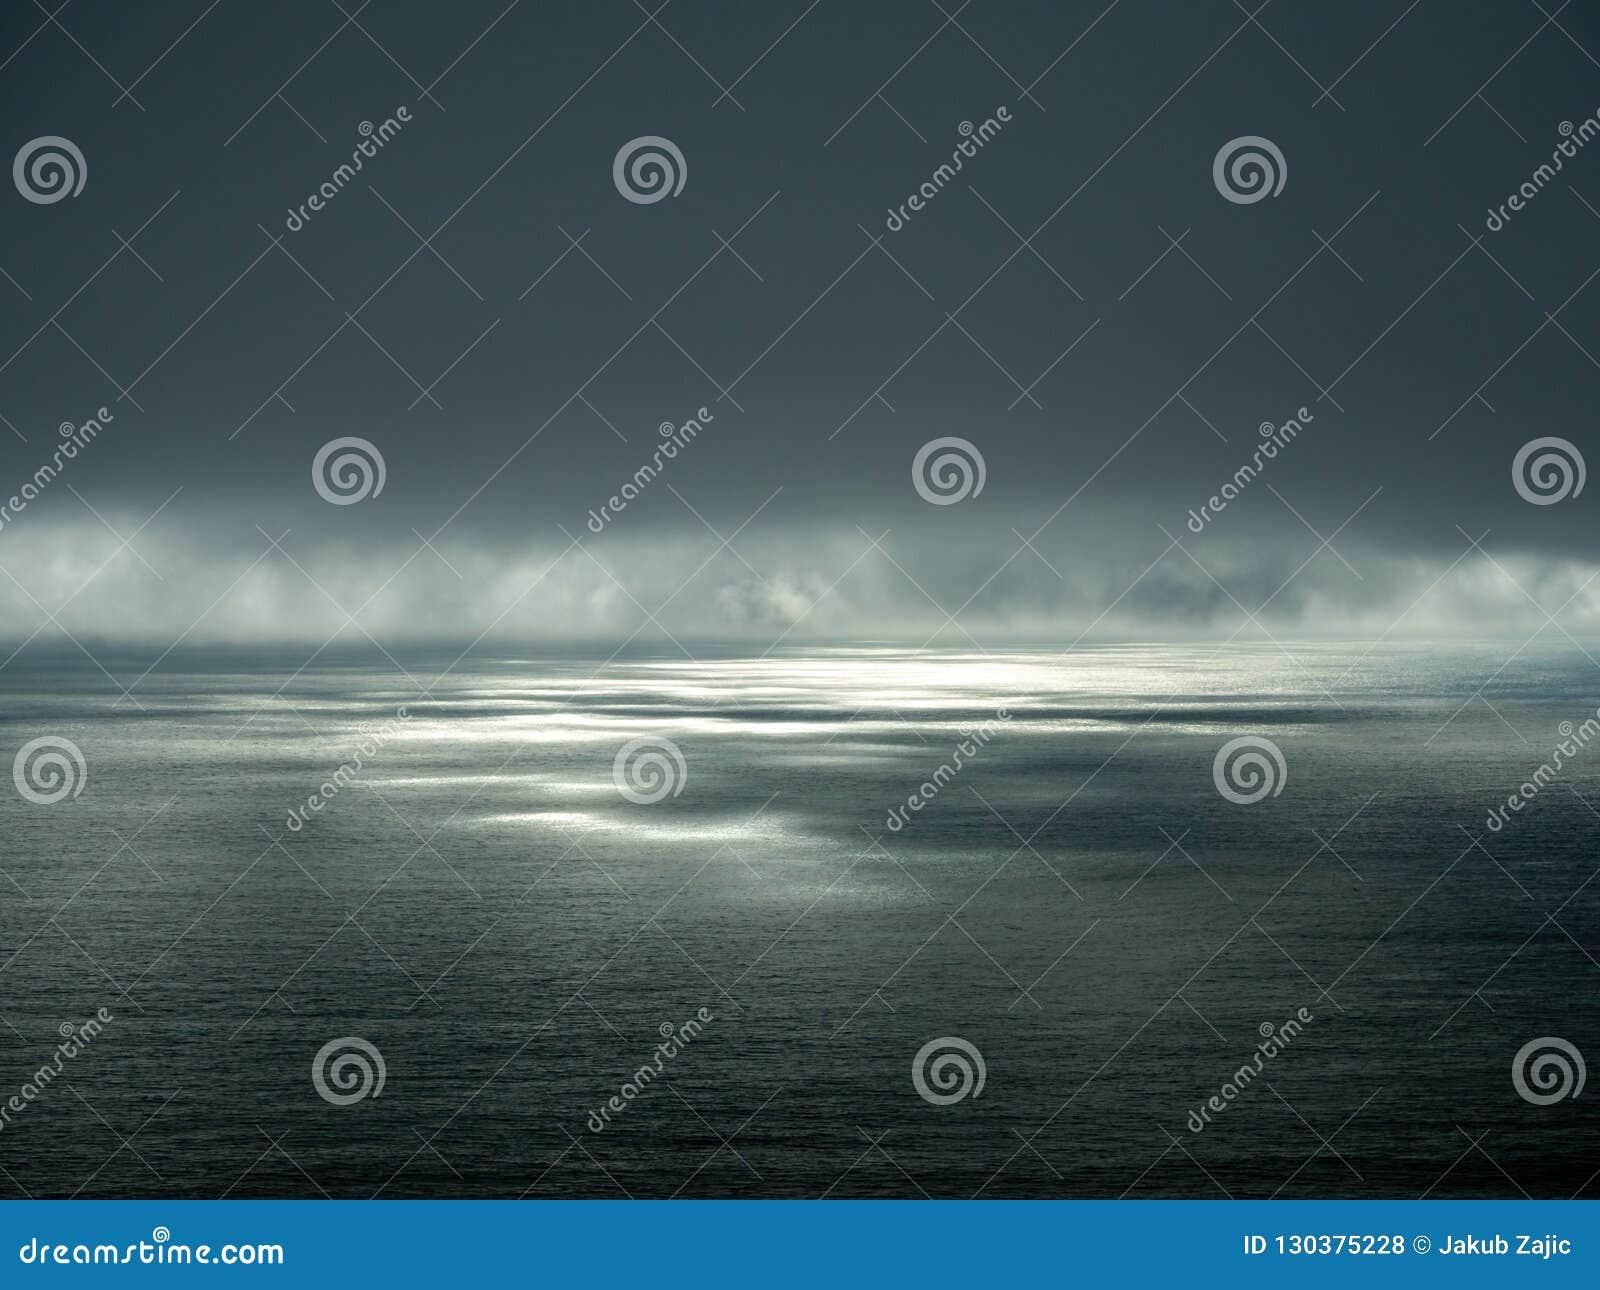 Big Sur California coast, bridge, beach, rocks, clouds, and surfing waves